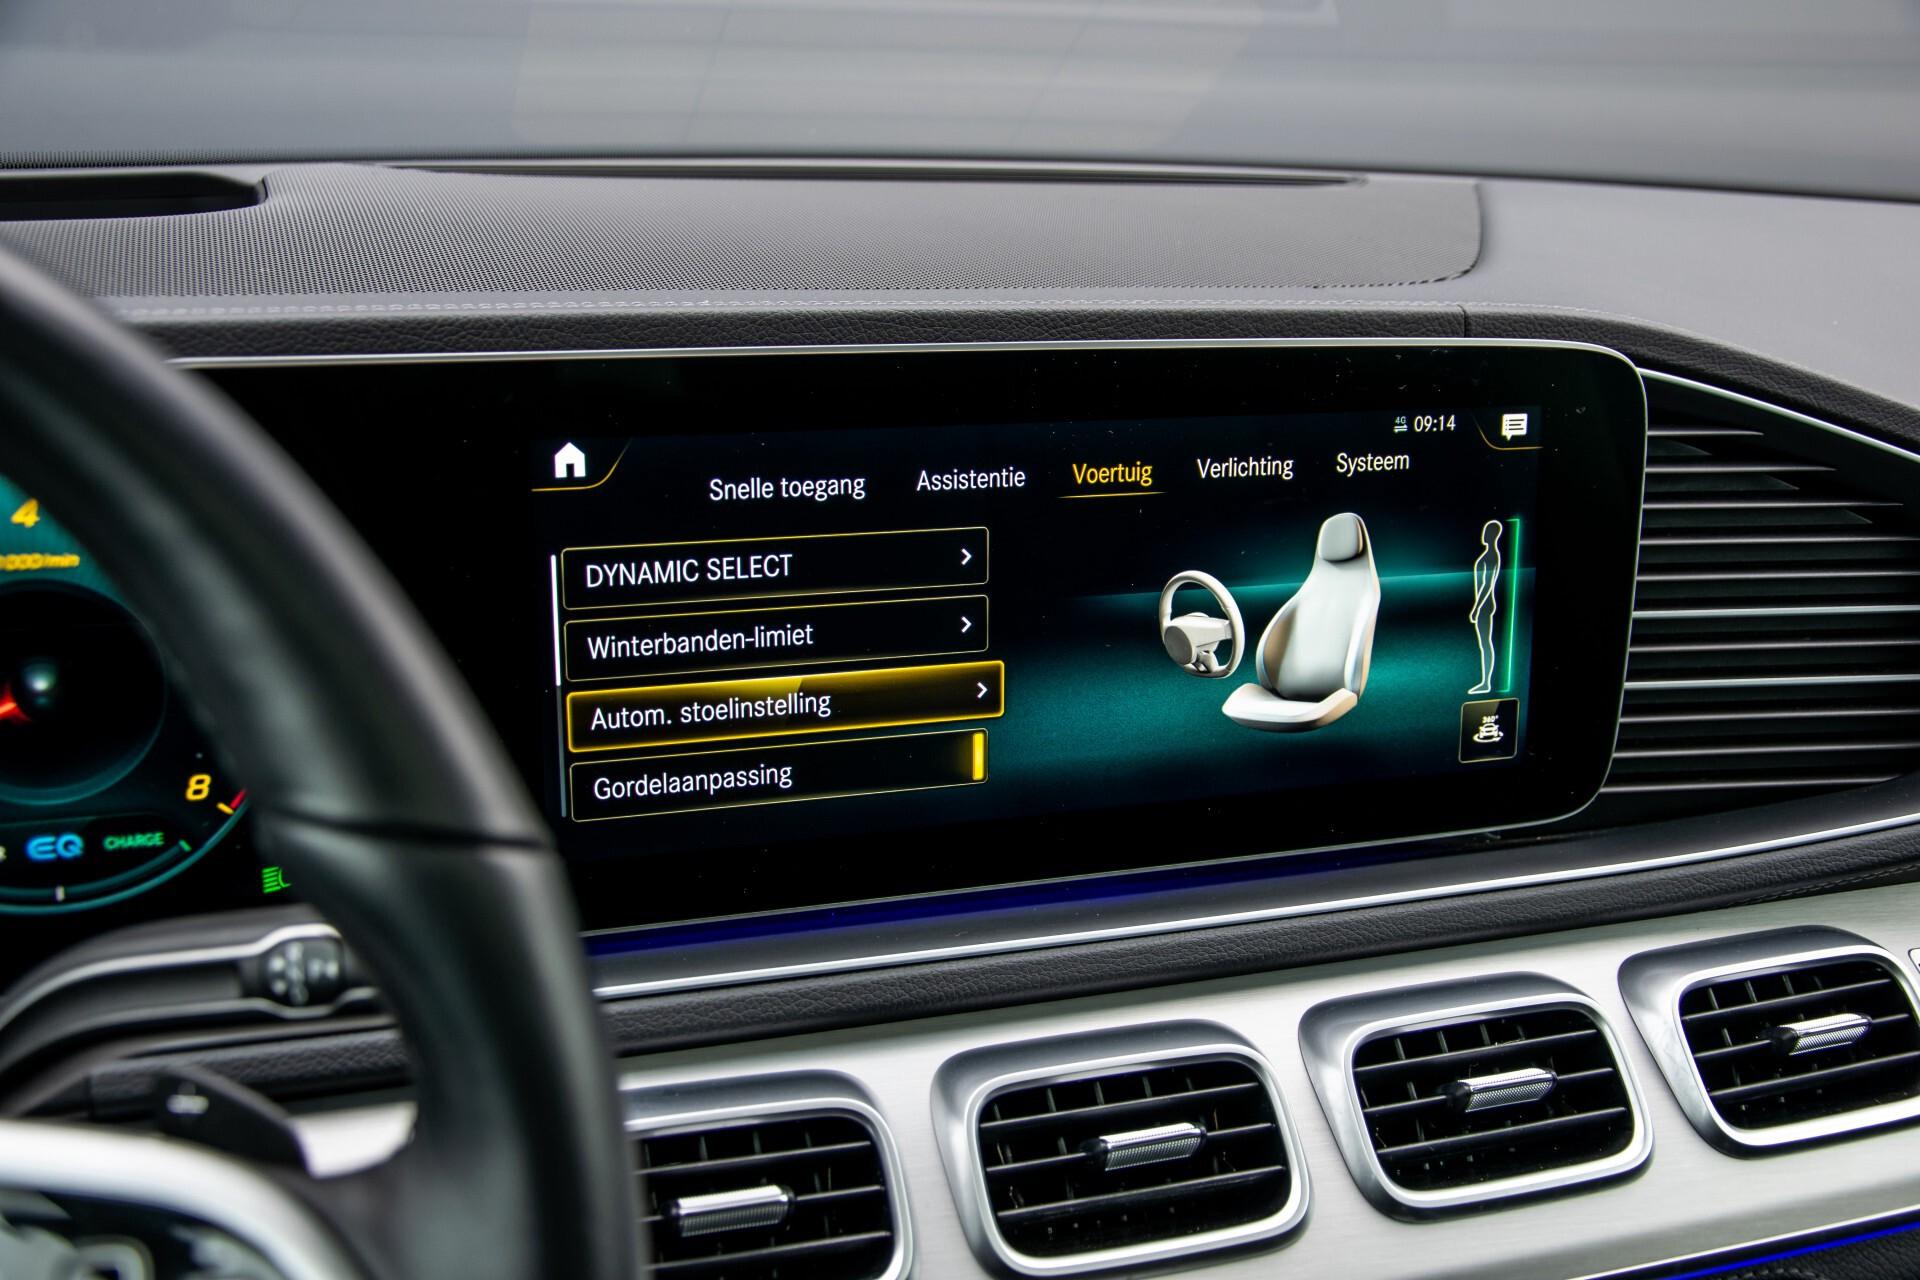 Mercedes-Benz GLE 450 4-M 7-Persoons AMG Massage/Rij-assist/Keyless/TV/360/Night/Trekhaak Aut9 Foto 38